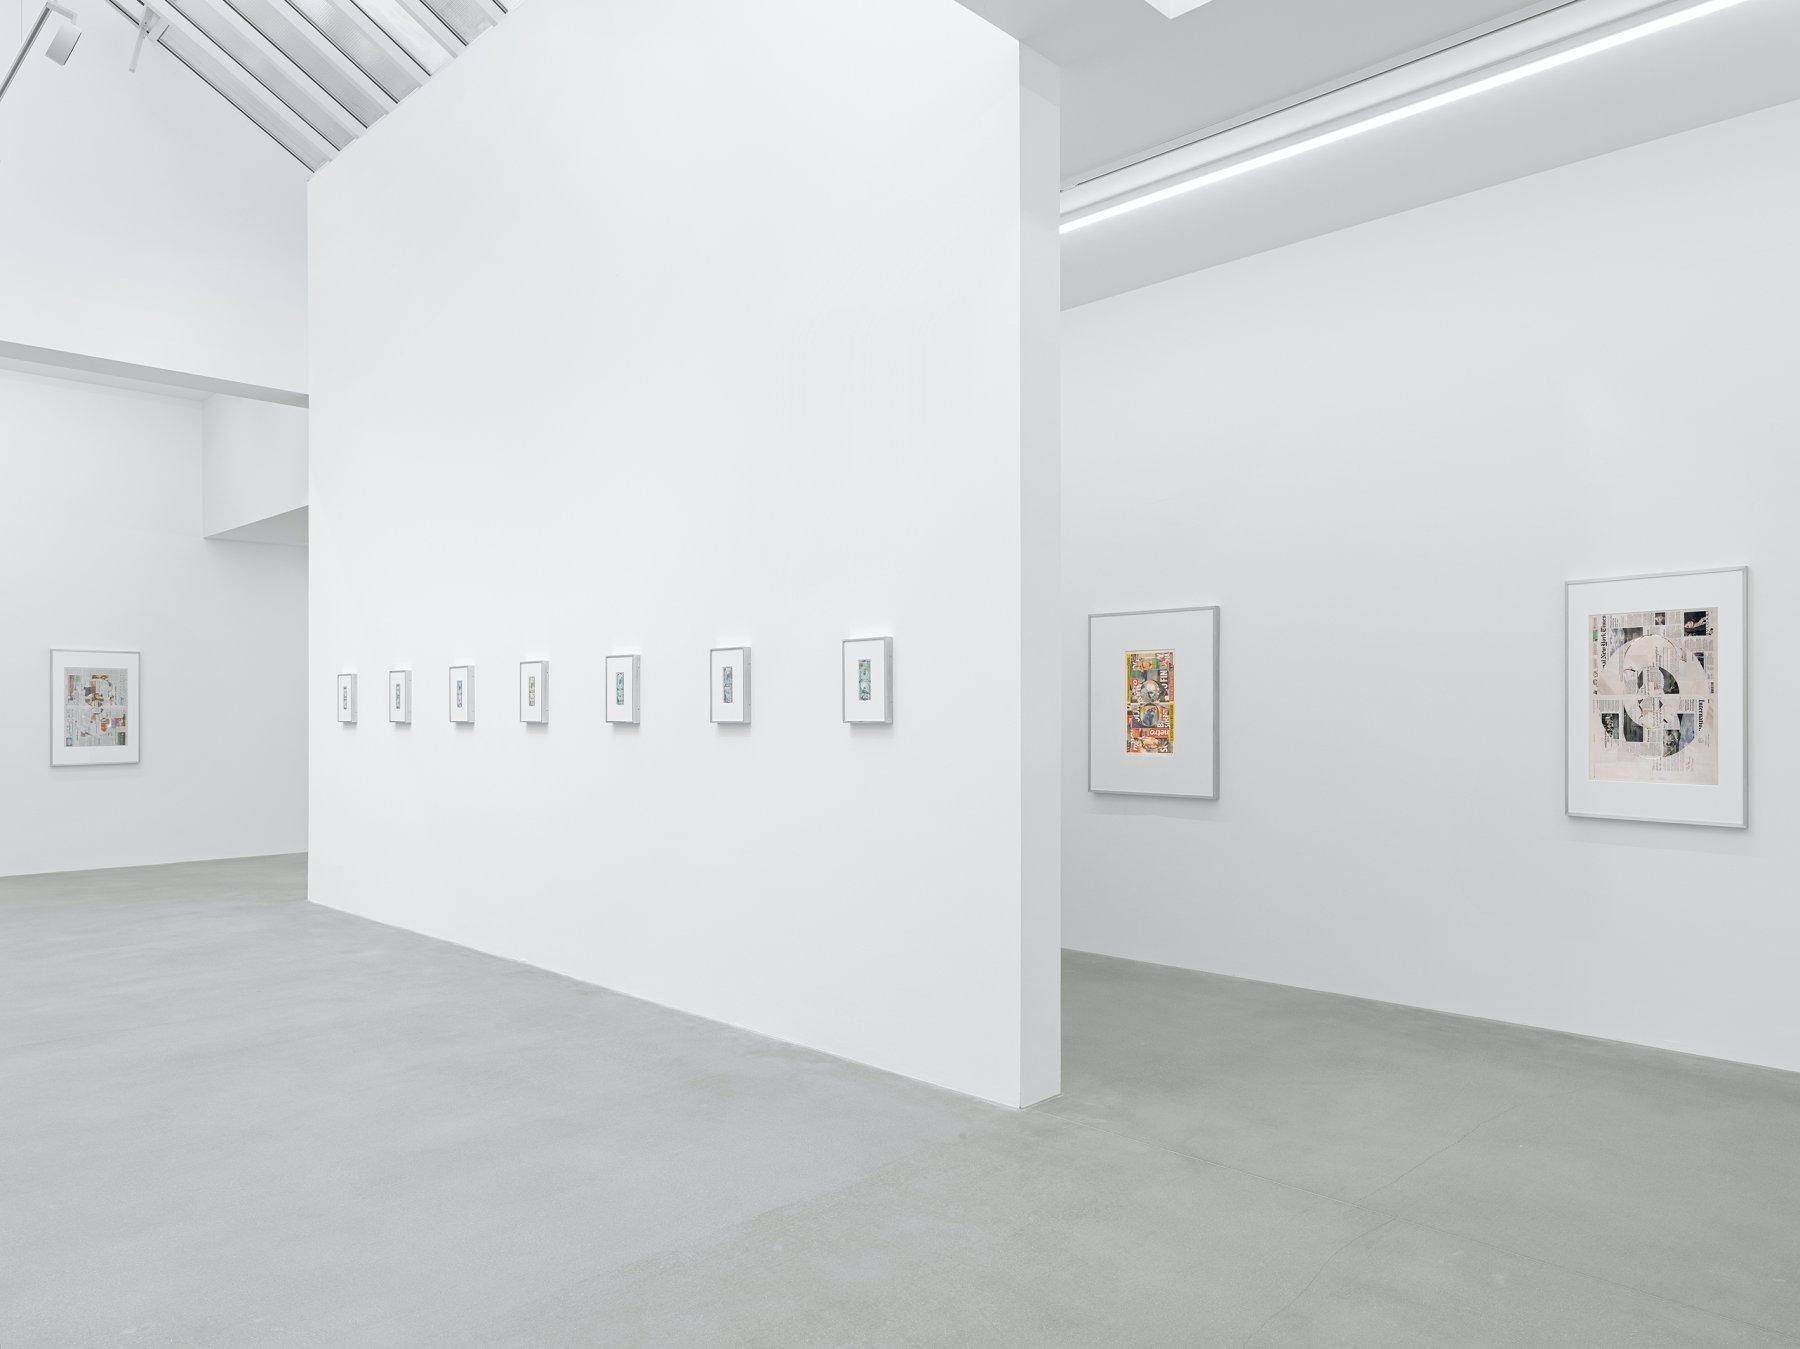 Galerie Eva Presenhuber Waldmanstrasse Walead Beshty 1